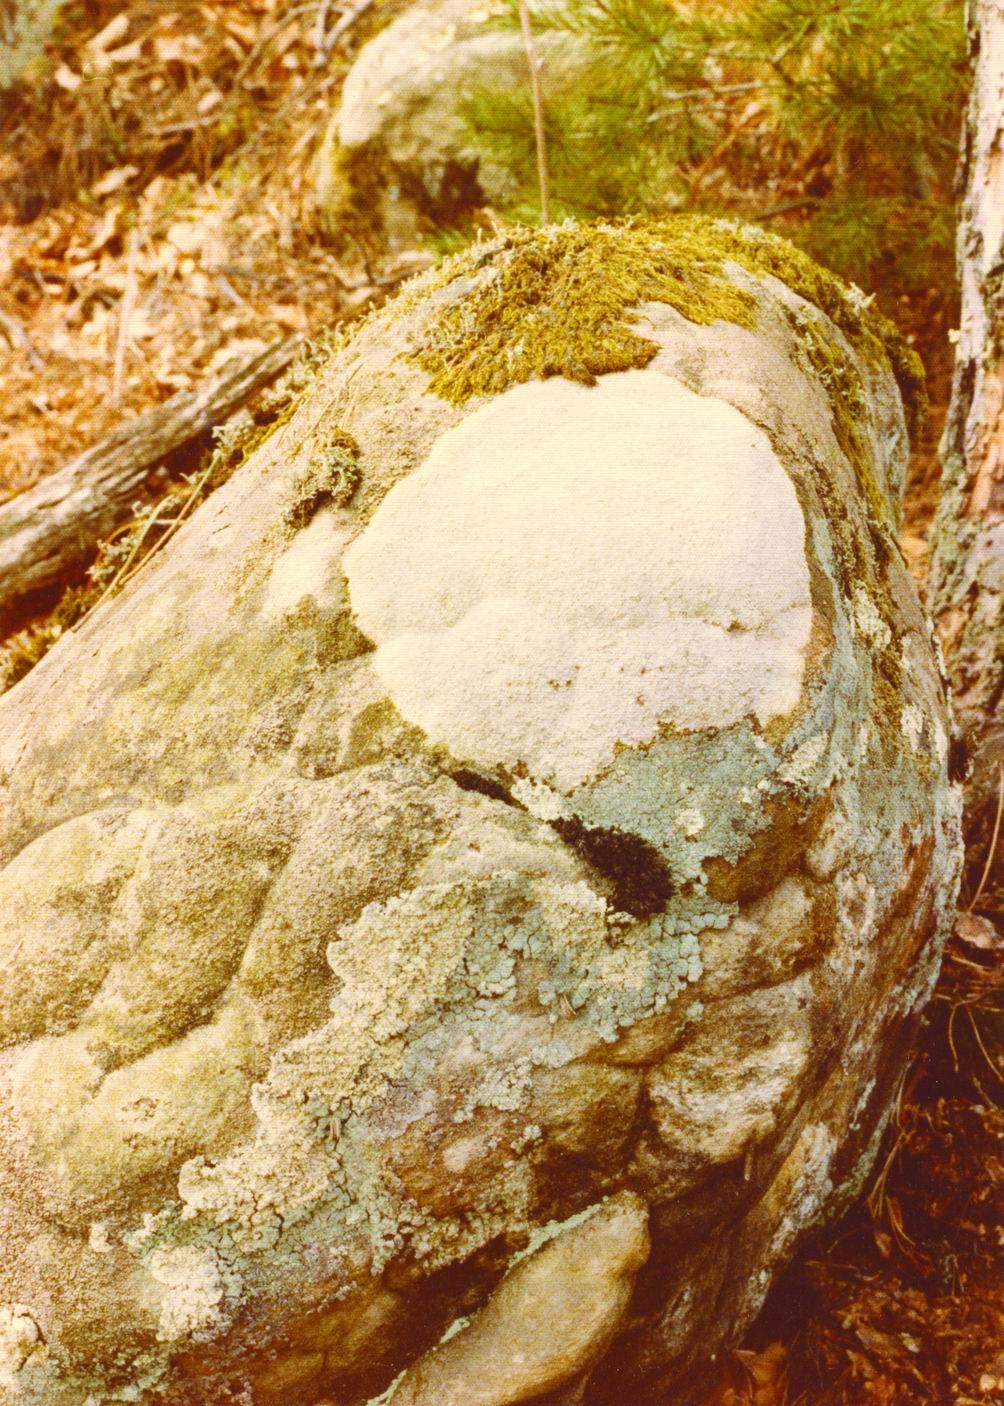 Fontainebleau 6 - 1979.1